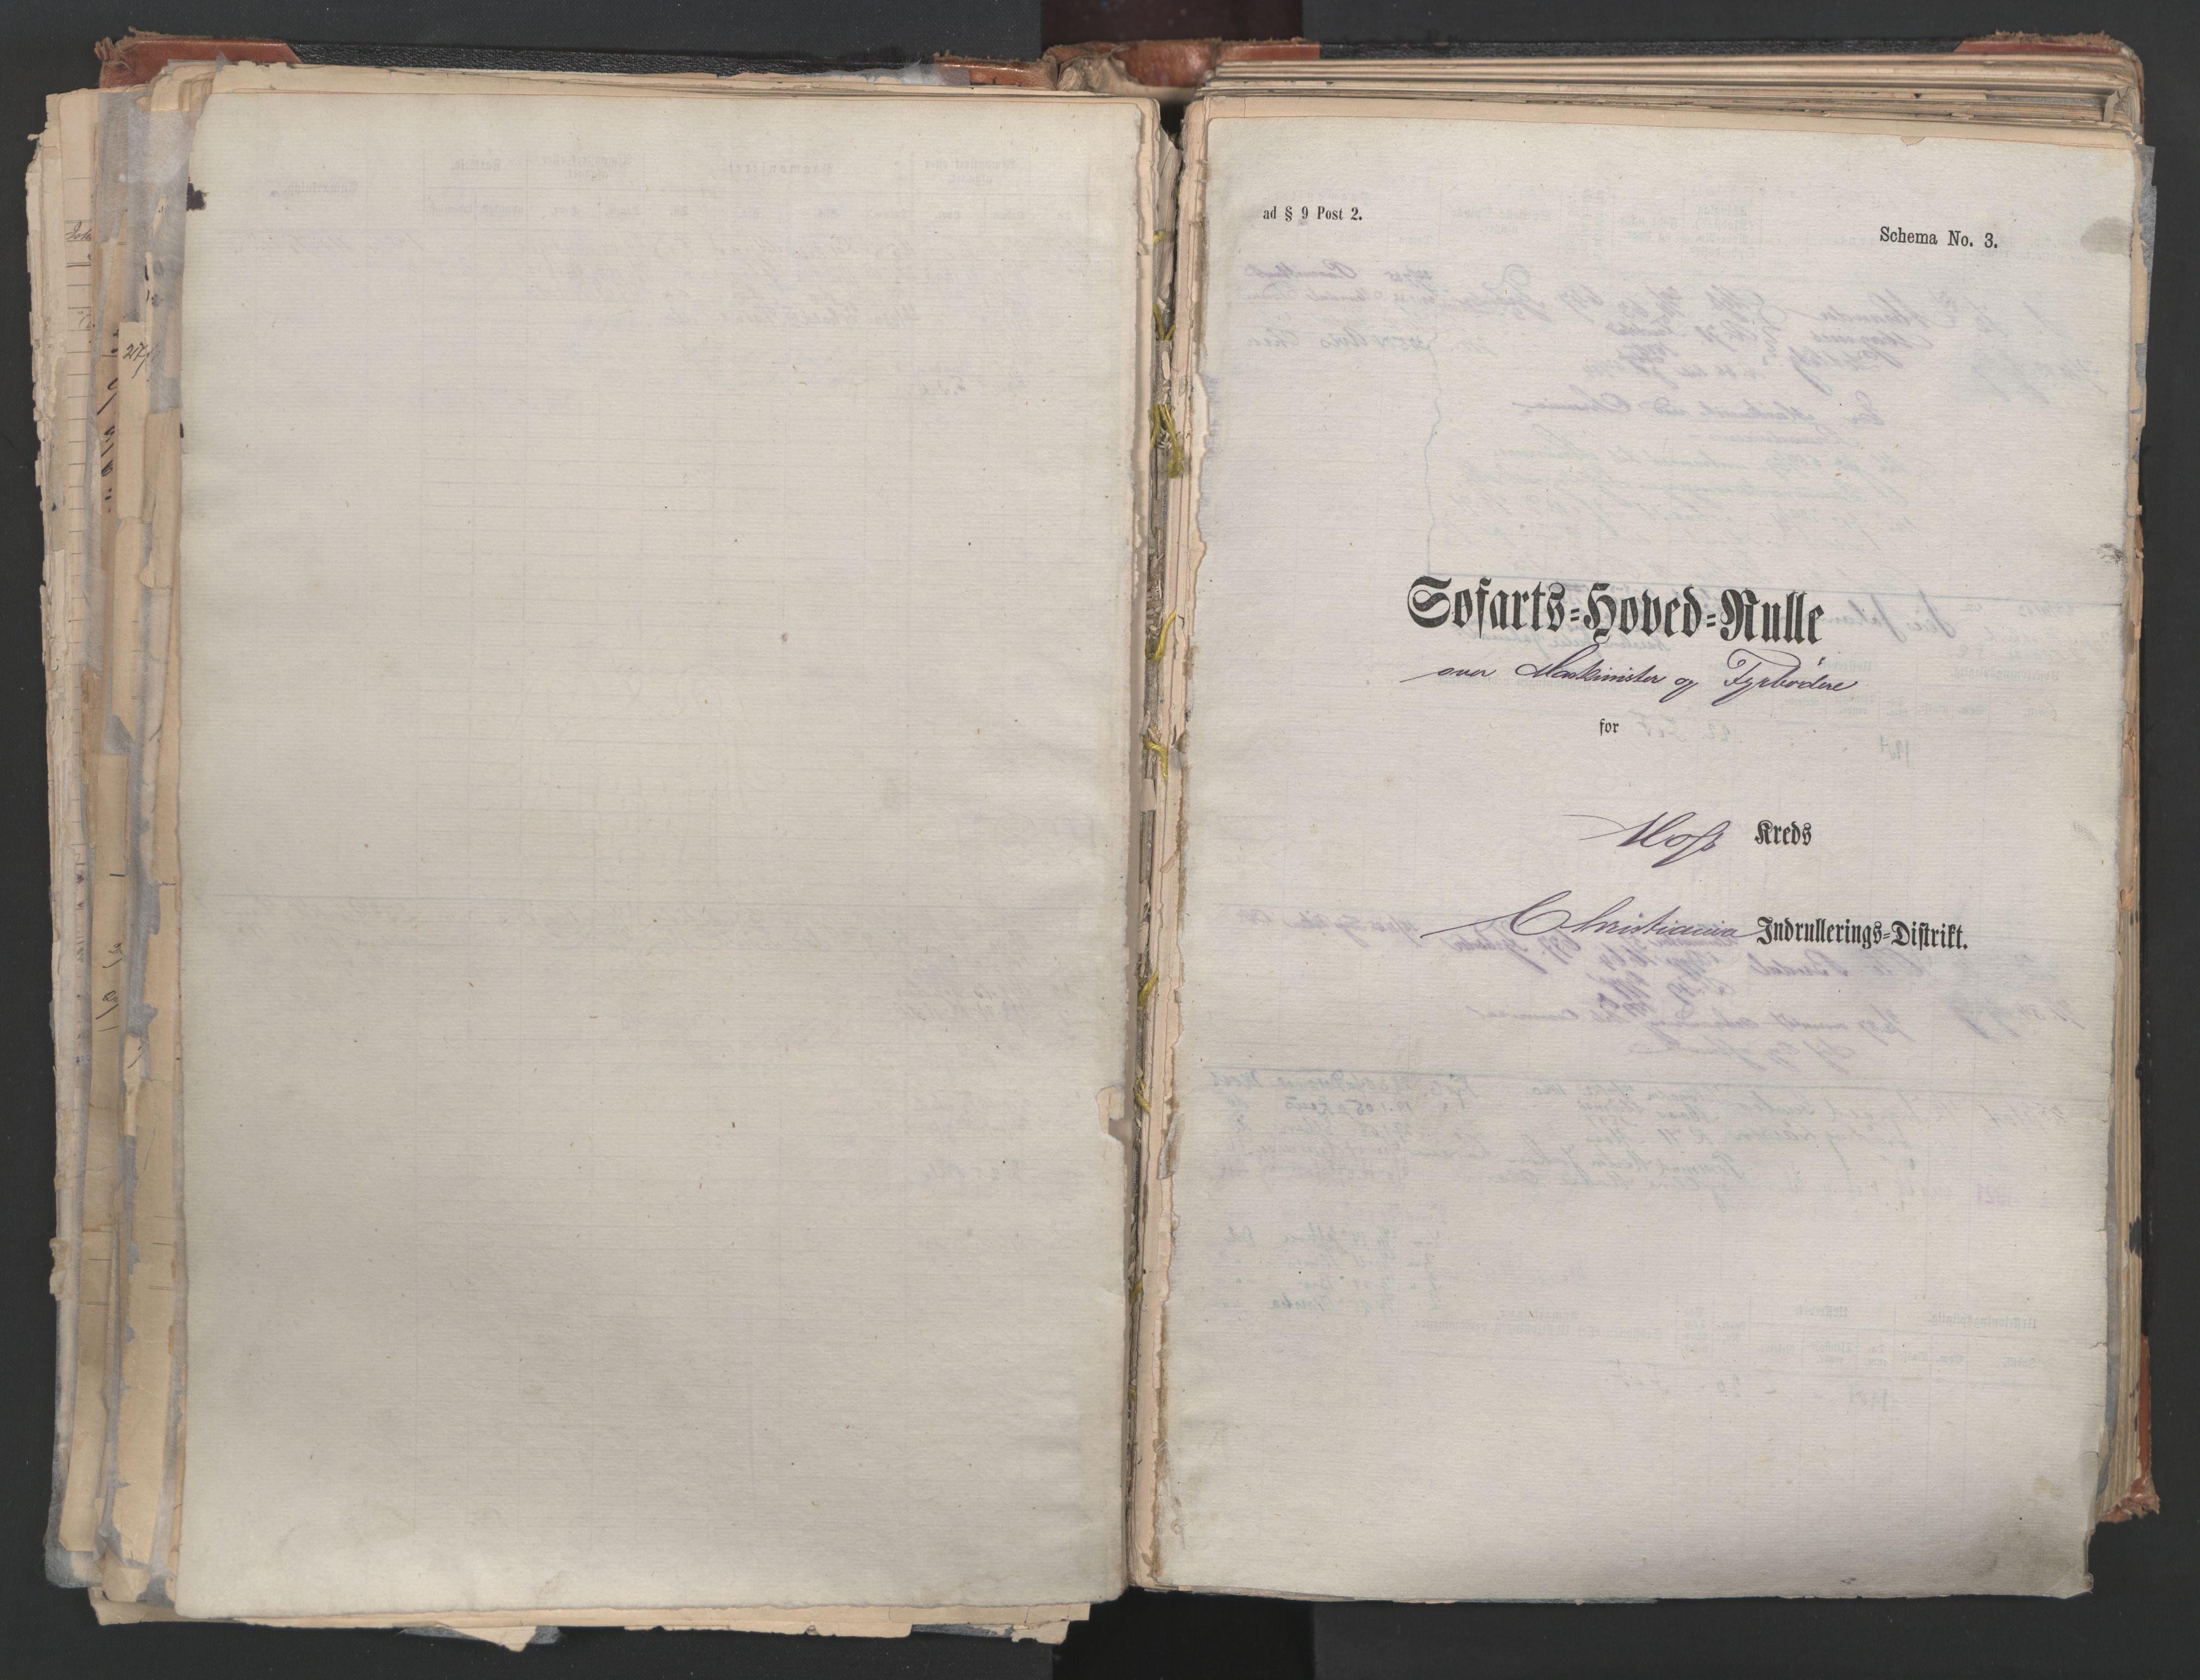 SAO, Oslo sjømannskontor, F/Fd/L0006: B-rulle, 1883, s. upaginert